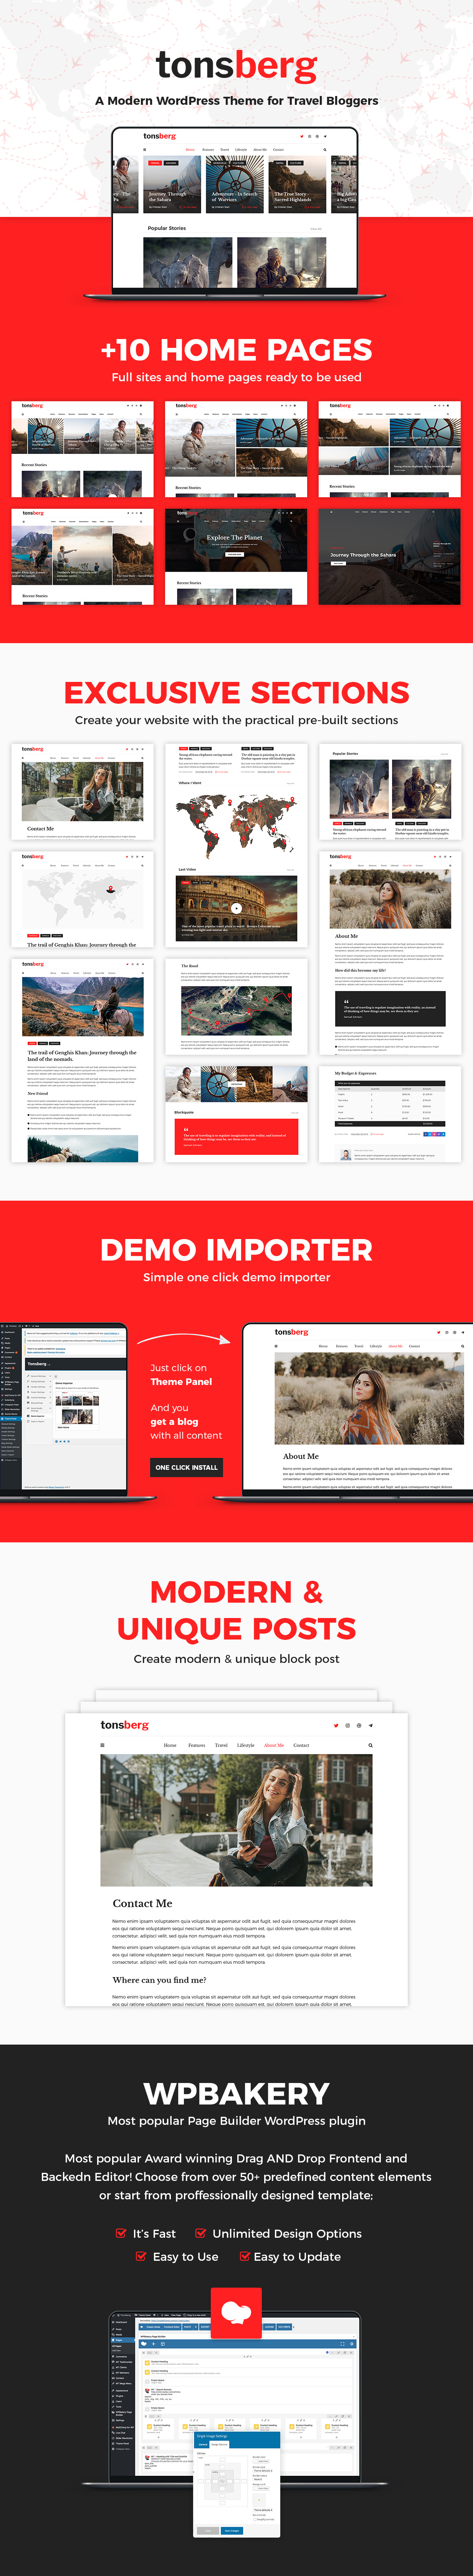 Tonsberg - A Modern WordPress Theme for Travel Bloggers - 3